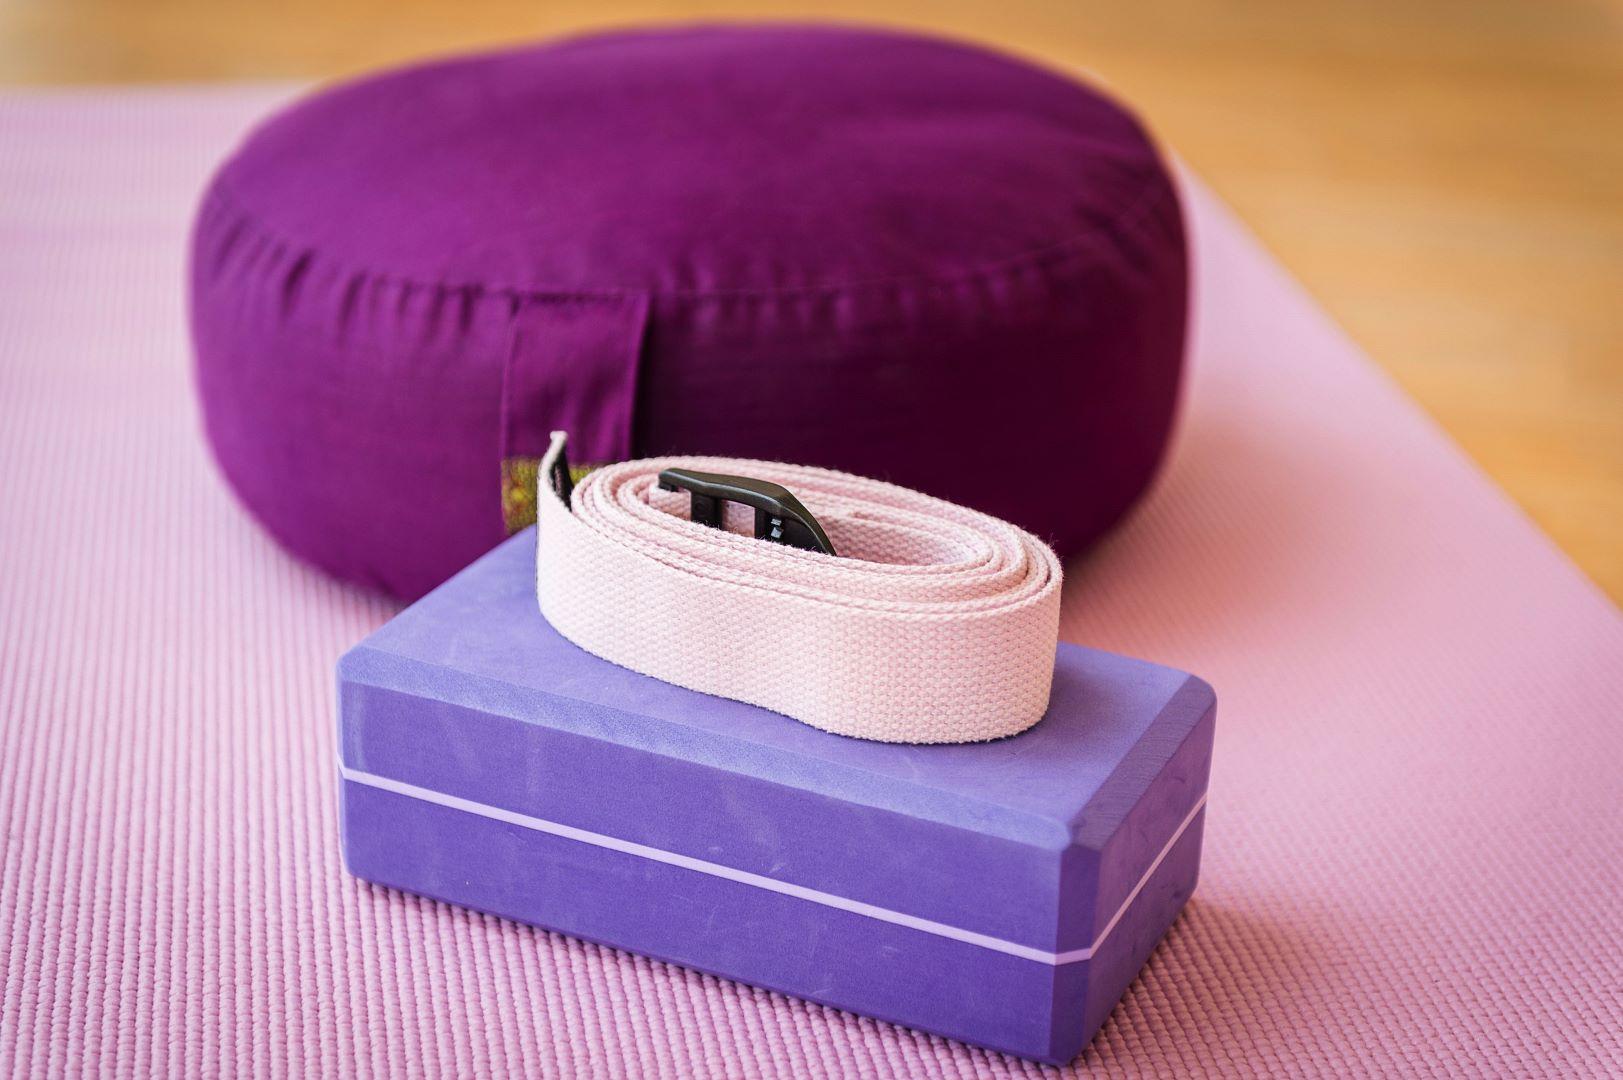 yoga-detail-polster-rupertus-kbp-6698-cfotobauer